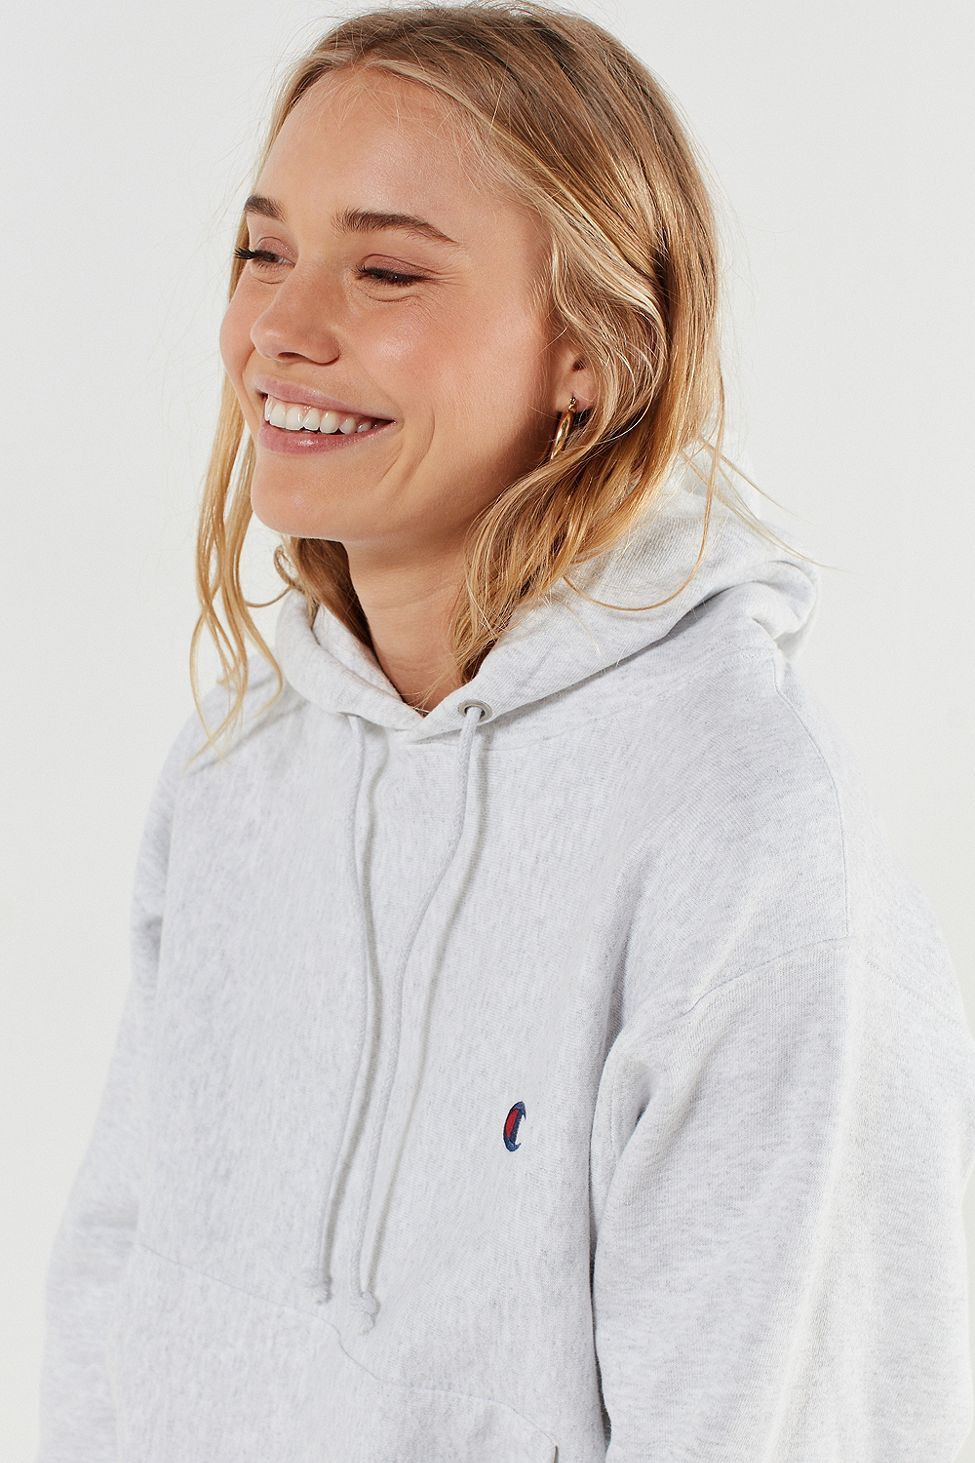 Urban Outfitters Champion Reverse Weave Logo Hoodie Sweatshirt S Fashion Champion Clothing Sweatshirts Hoodie [ 1463 x 975 Pixel ]